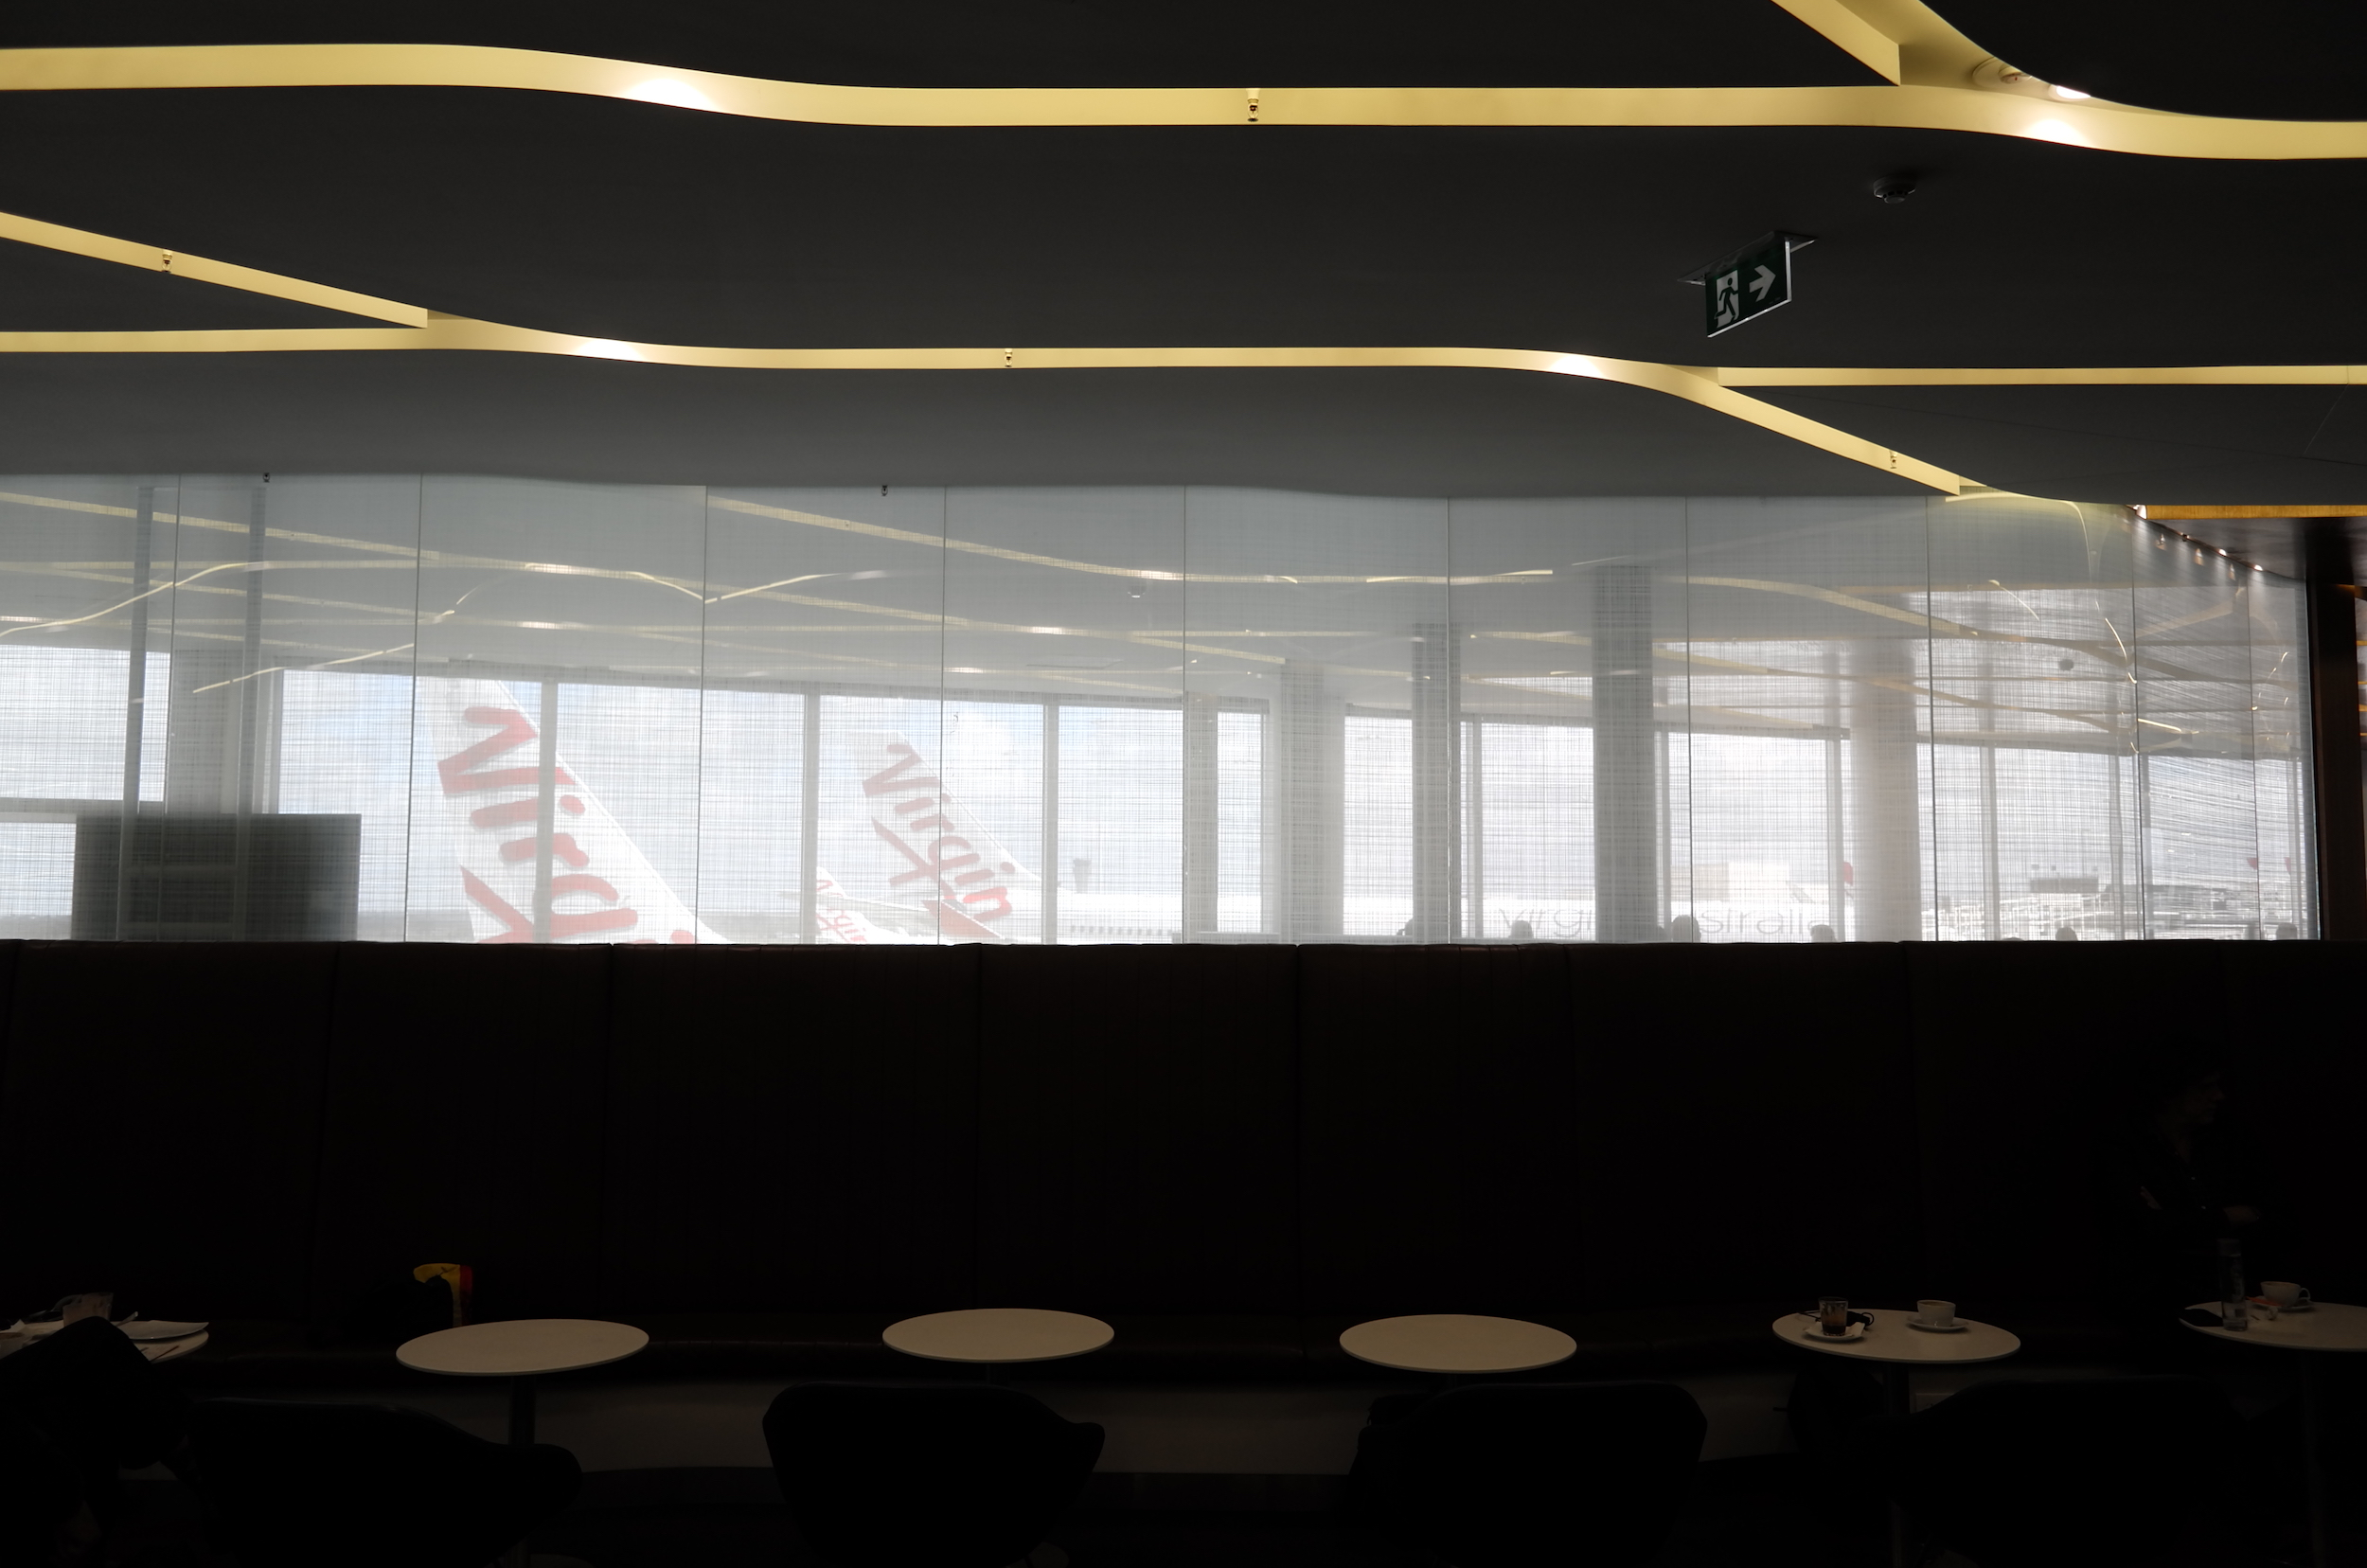 Lounge Review : メルボルン空港(MEL) ヴァージン・オーストラリア(VA) 国内線ラウンジ